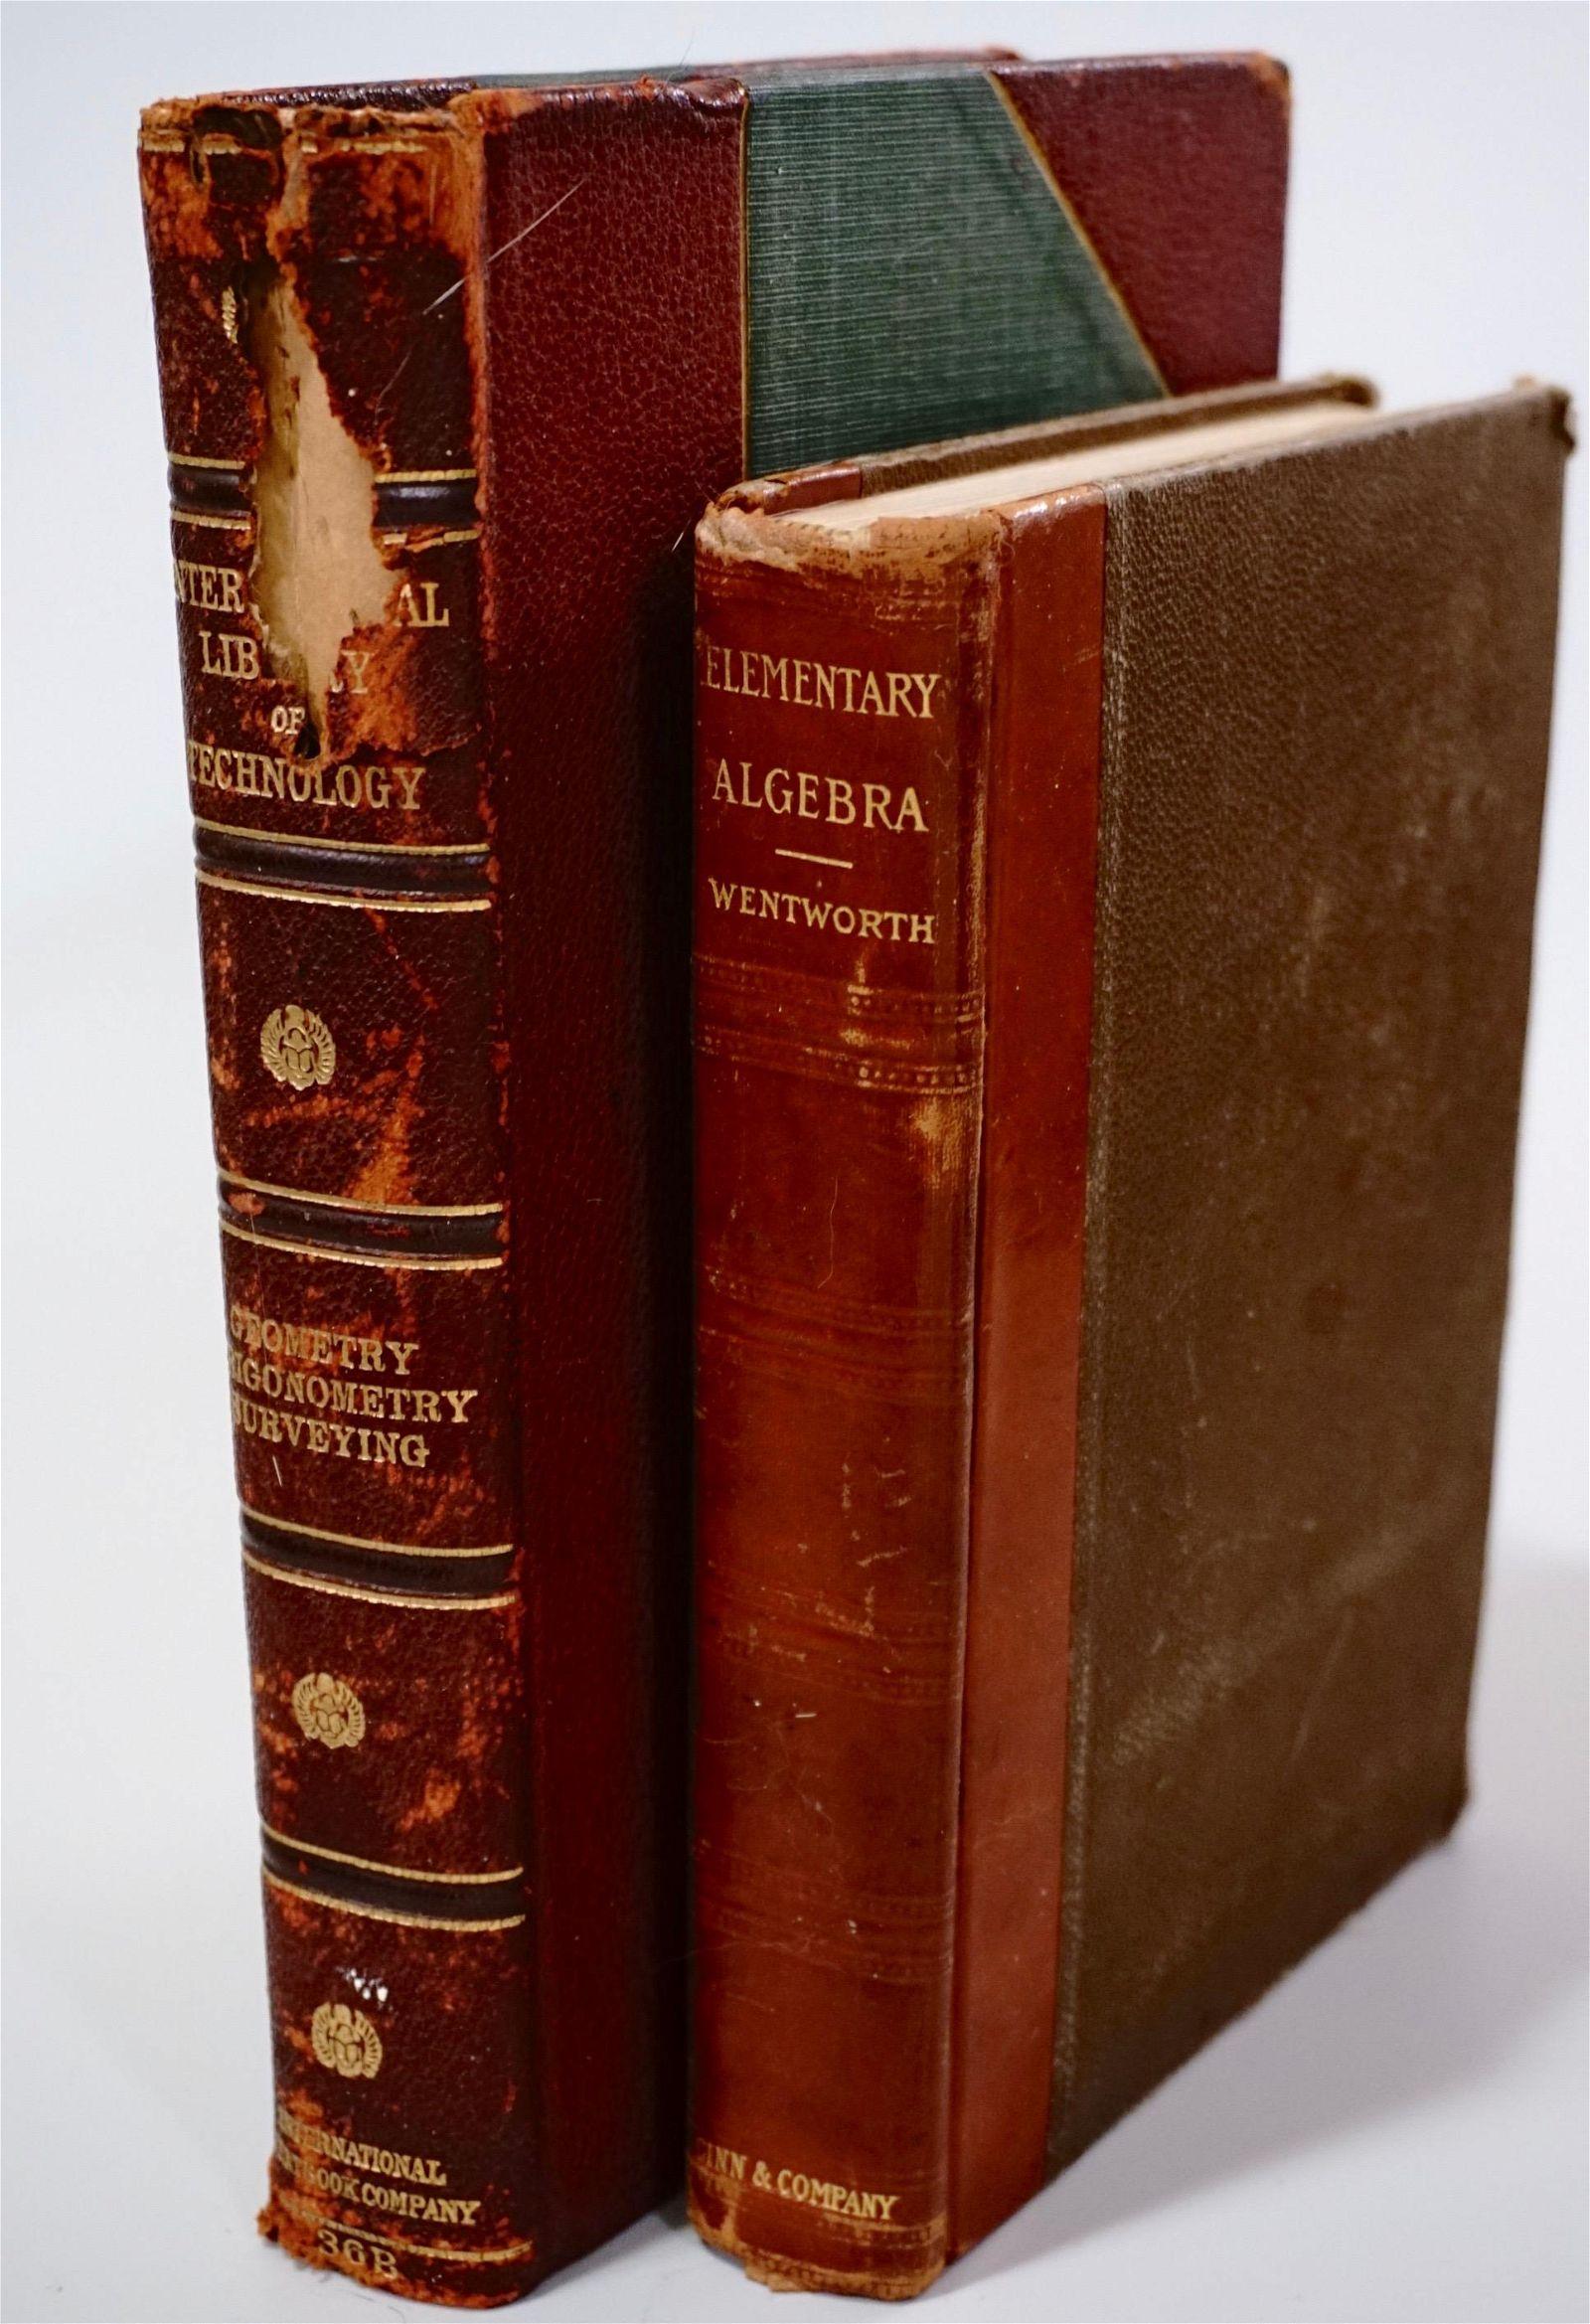 Antique Algebra Geometry Textbook Lot of 2 Books